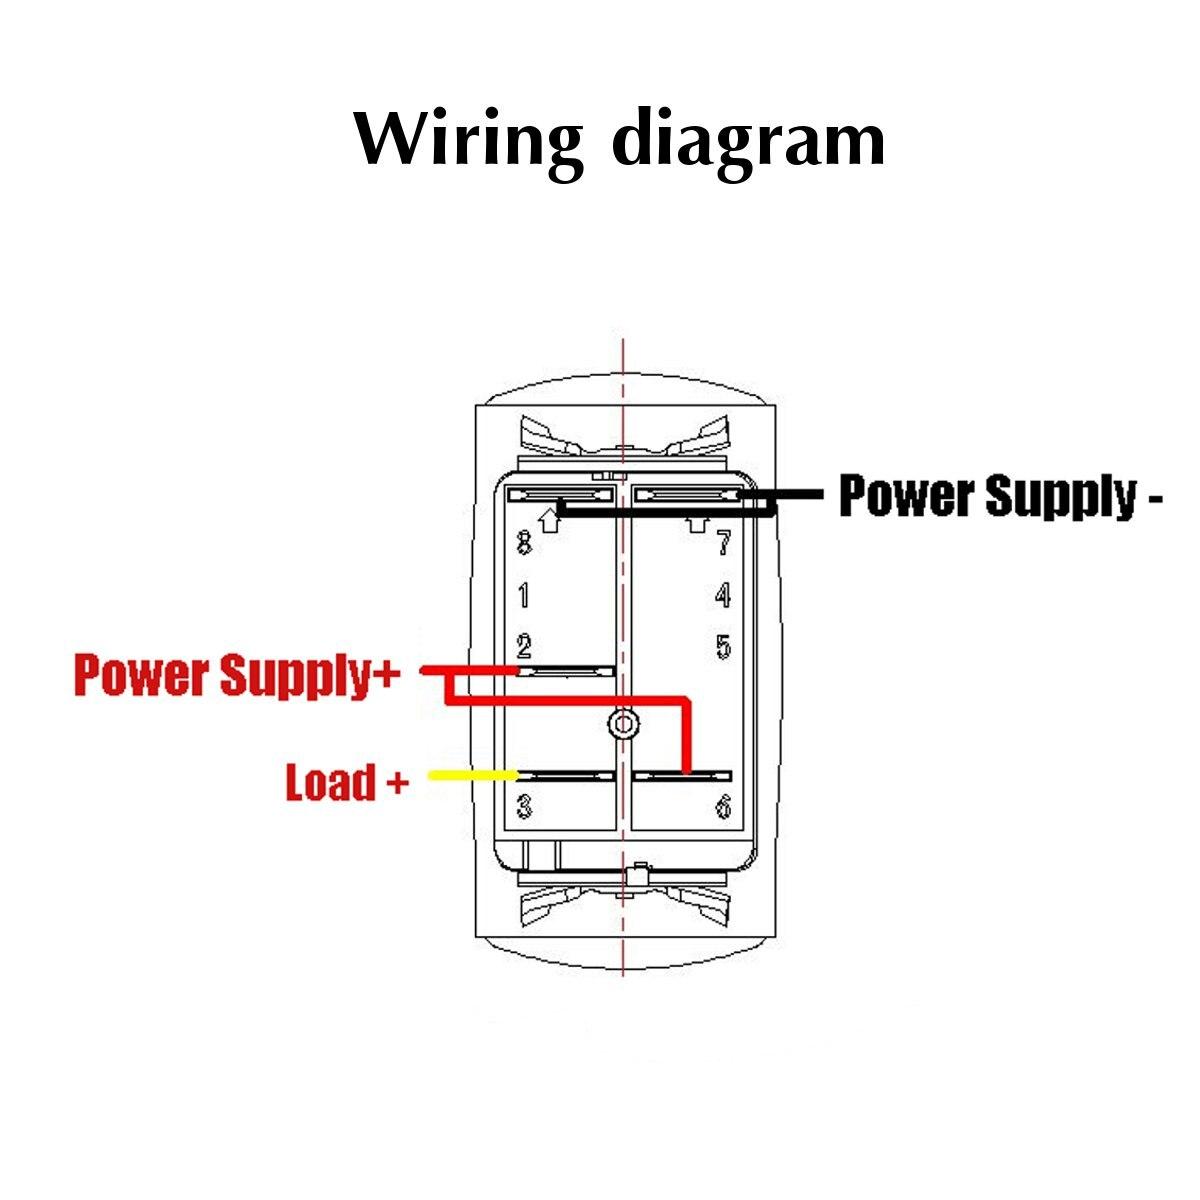 12 24v Mini Universal Electric 5pin Rocker Switch Led Cooling Fan Wiring Diagram Car Auto Waterproof